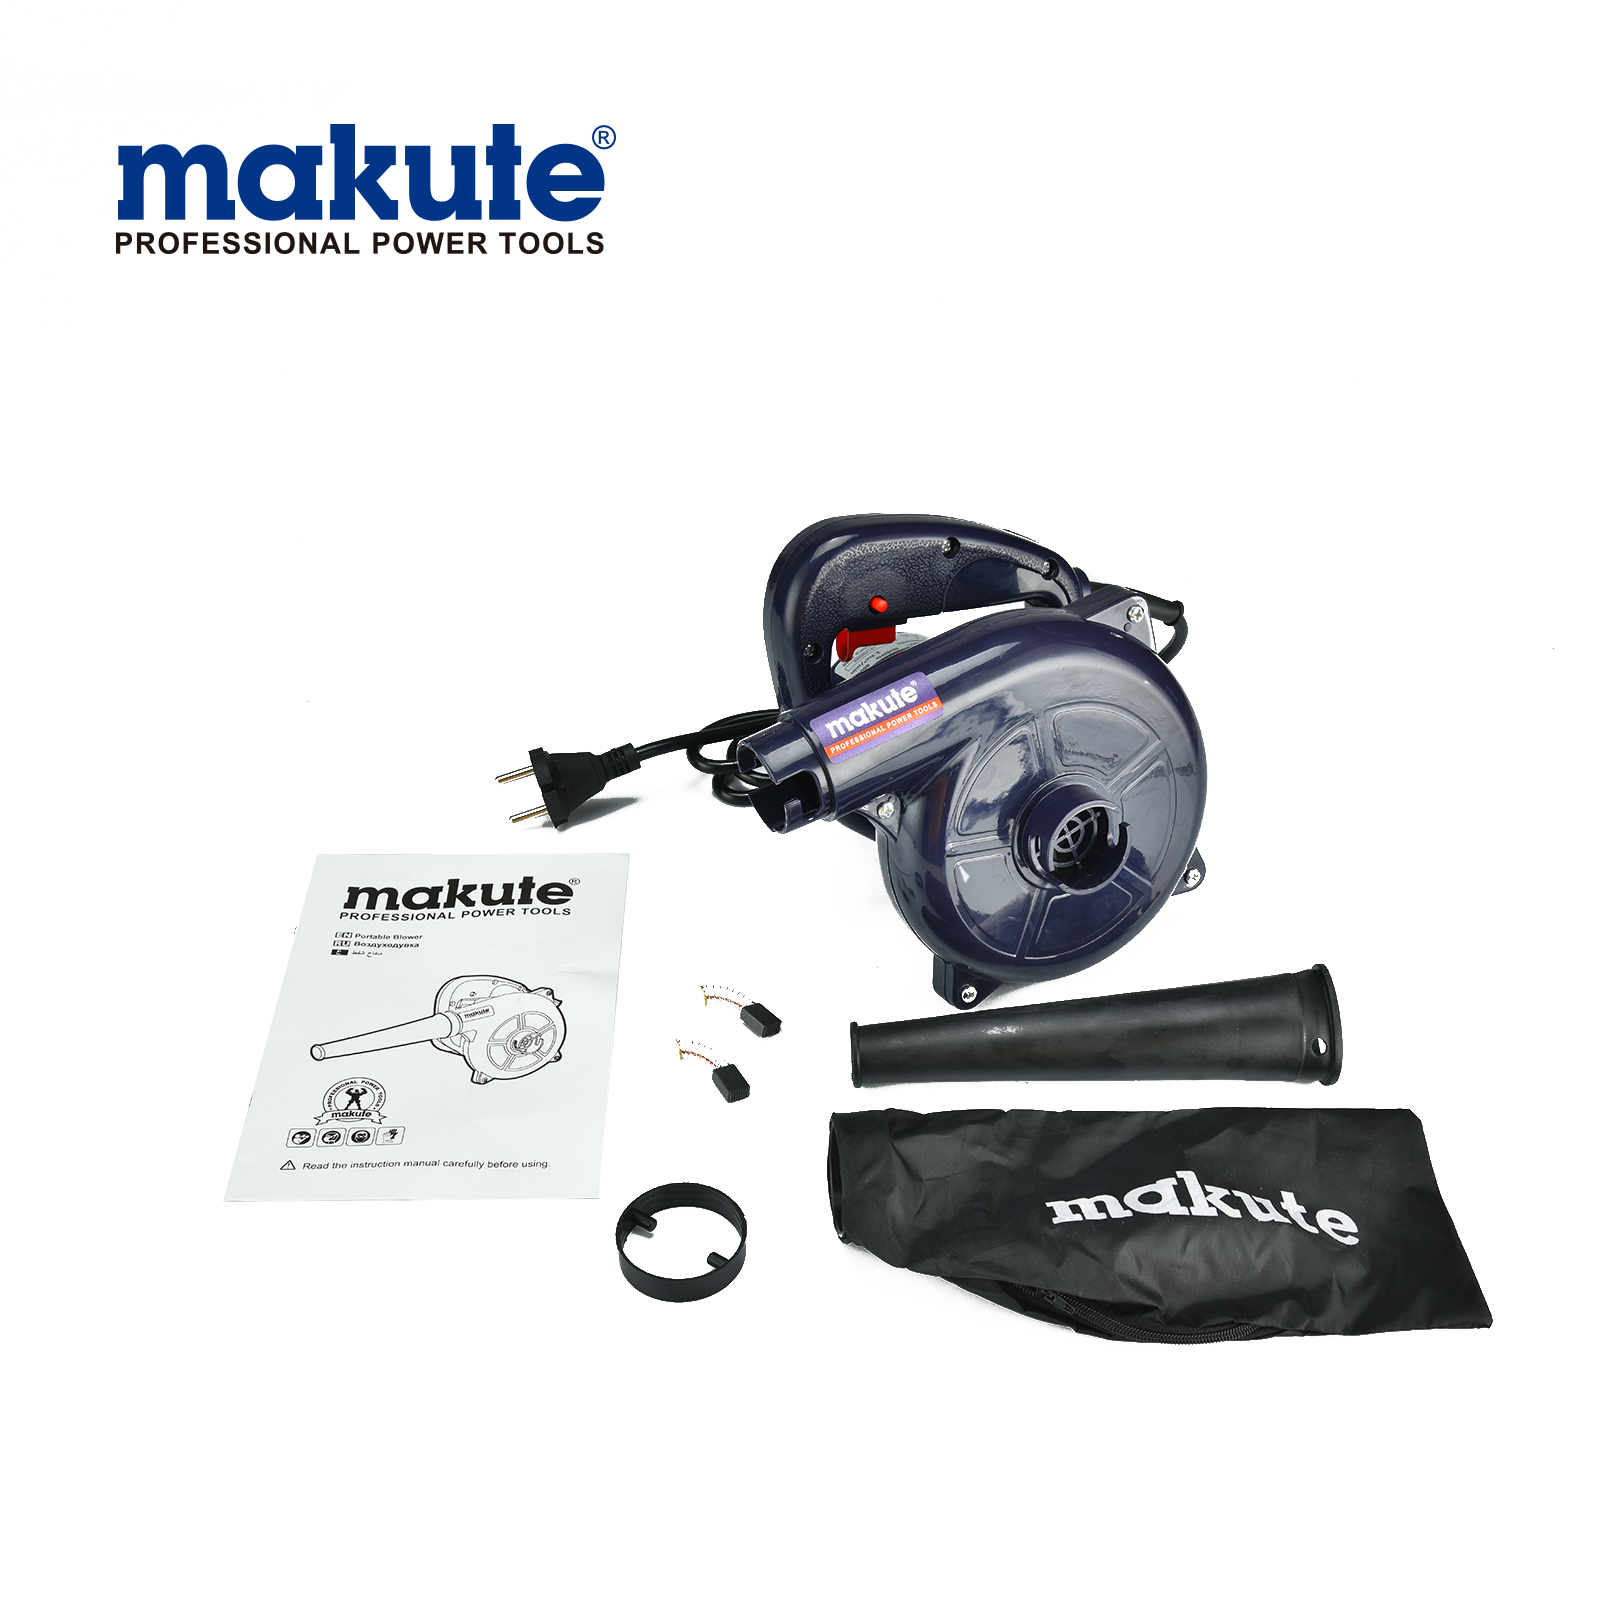 Makute 600W Professional Mini Electric Blower Power Tools (PB004)